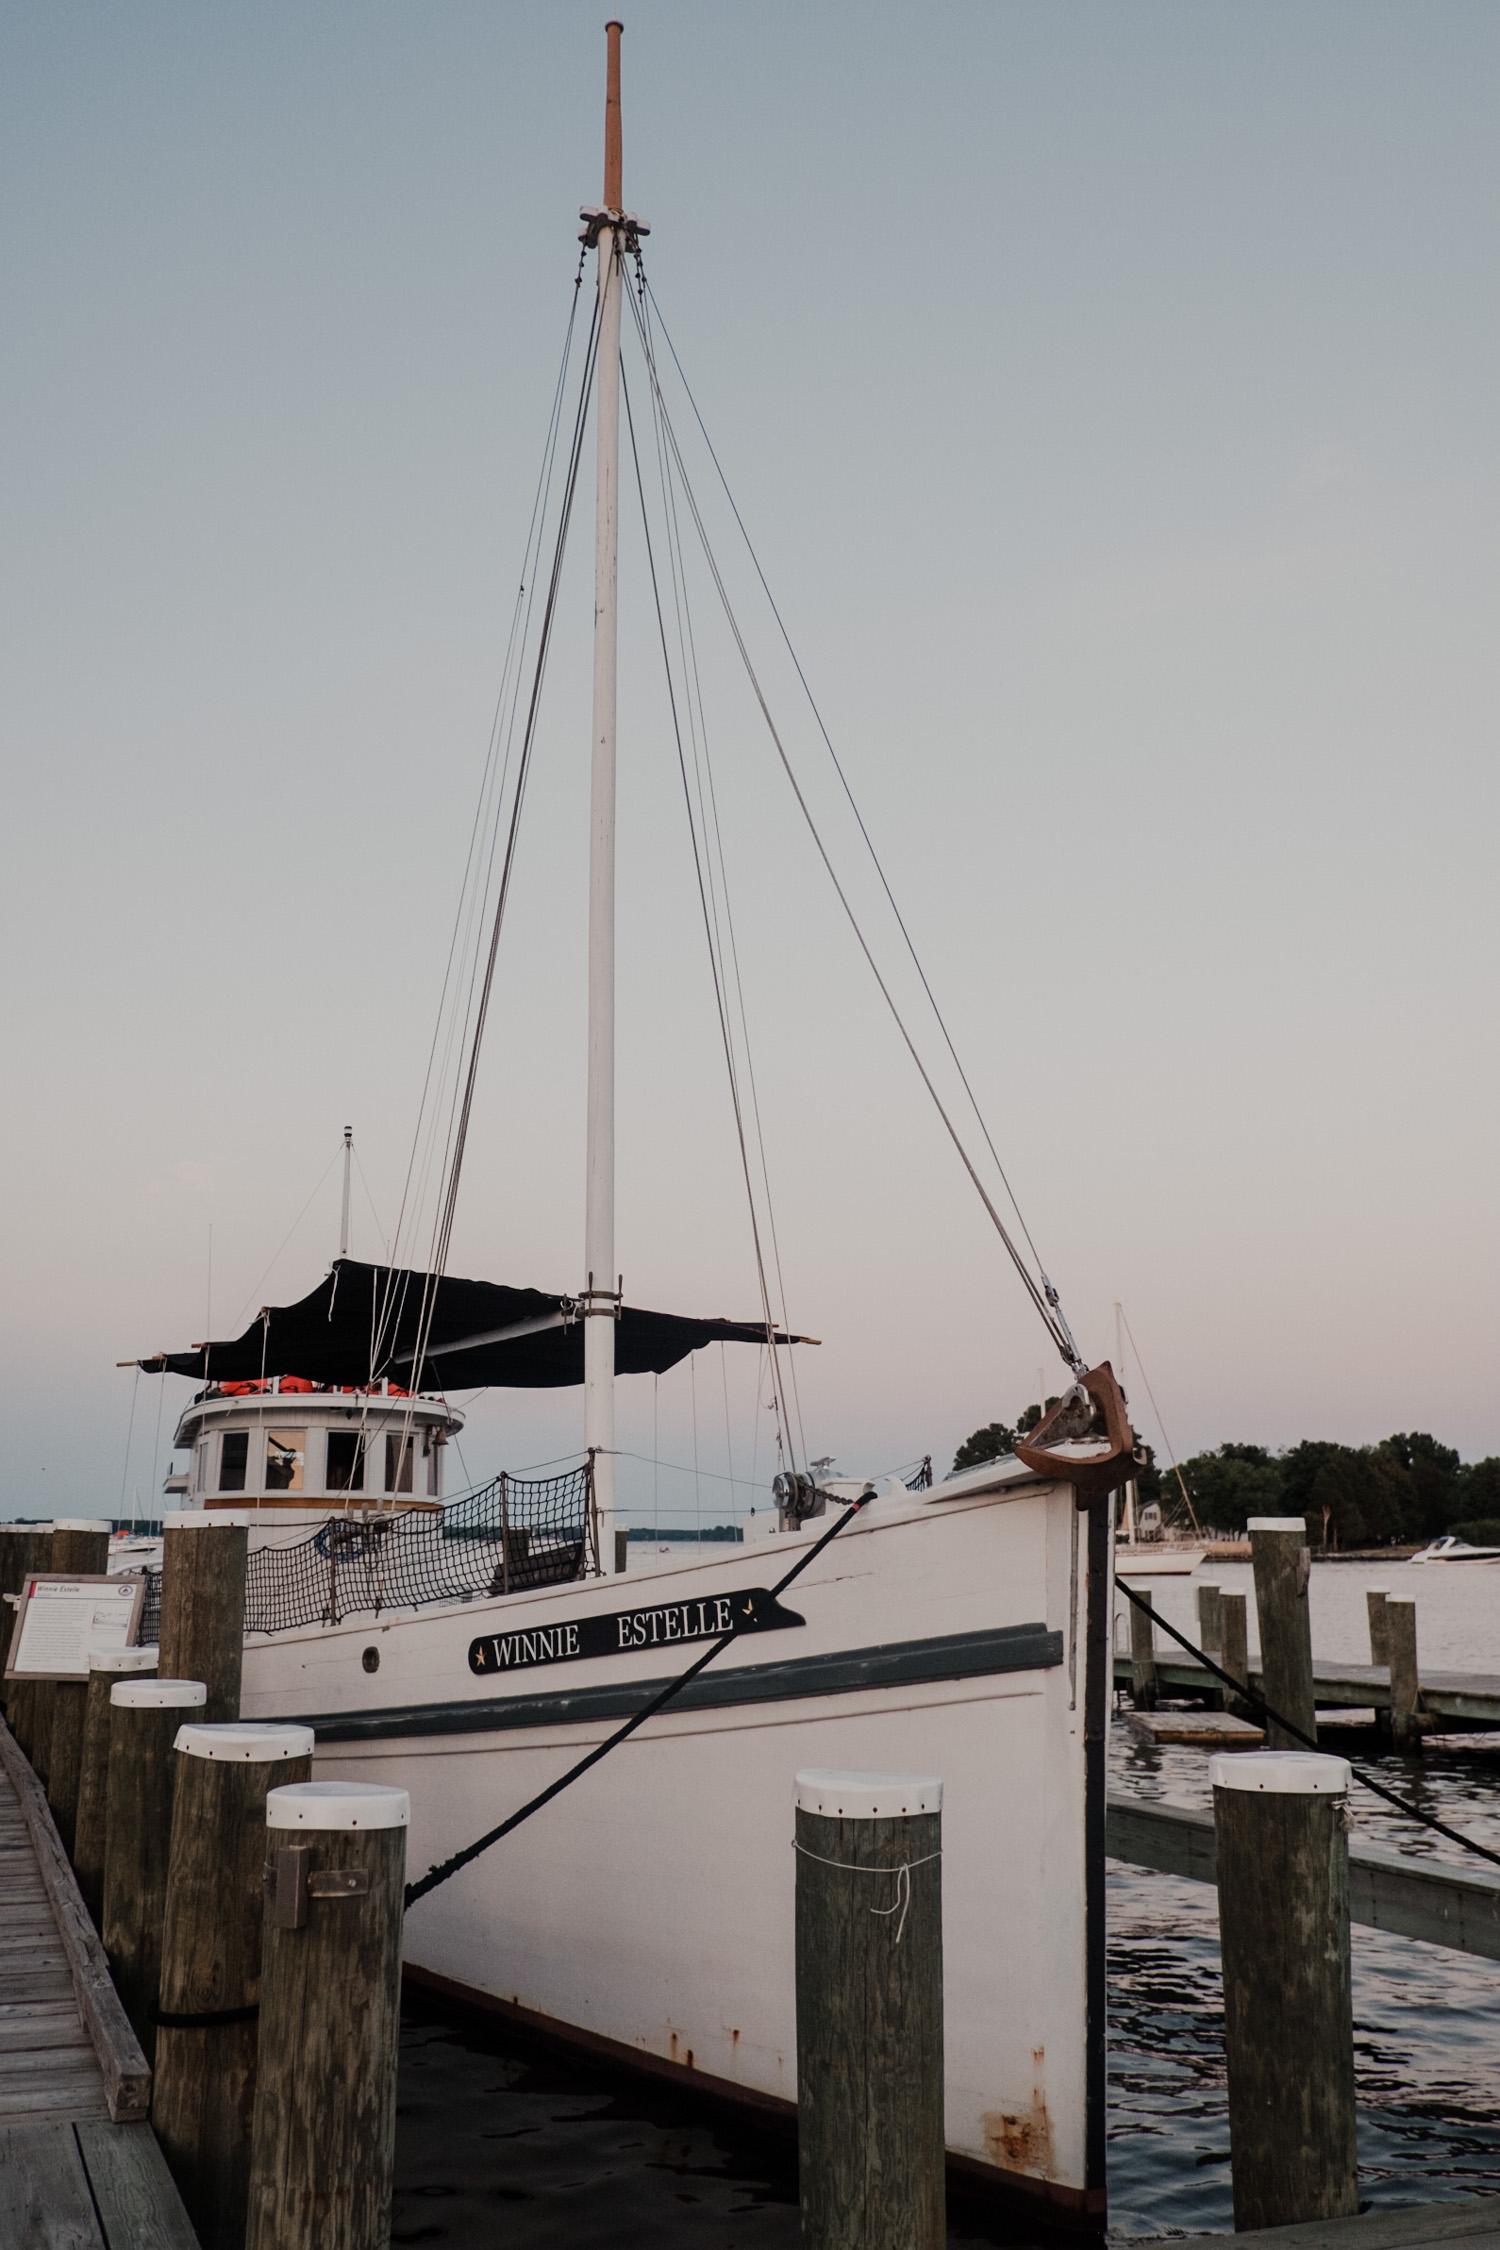 chesapeake bay maritime museum sailboat at the docks